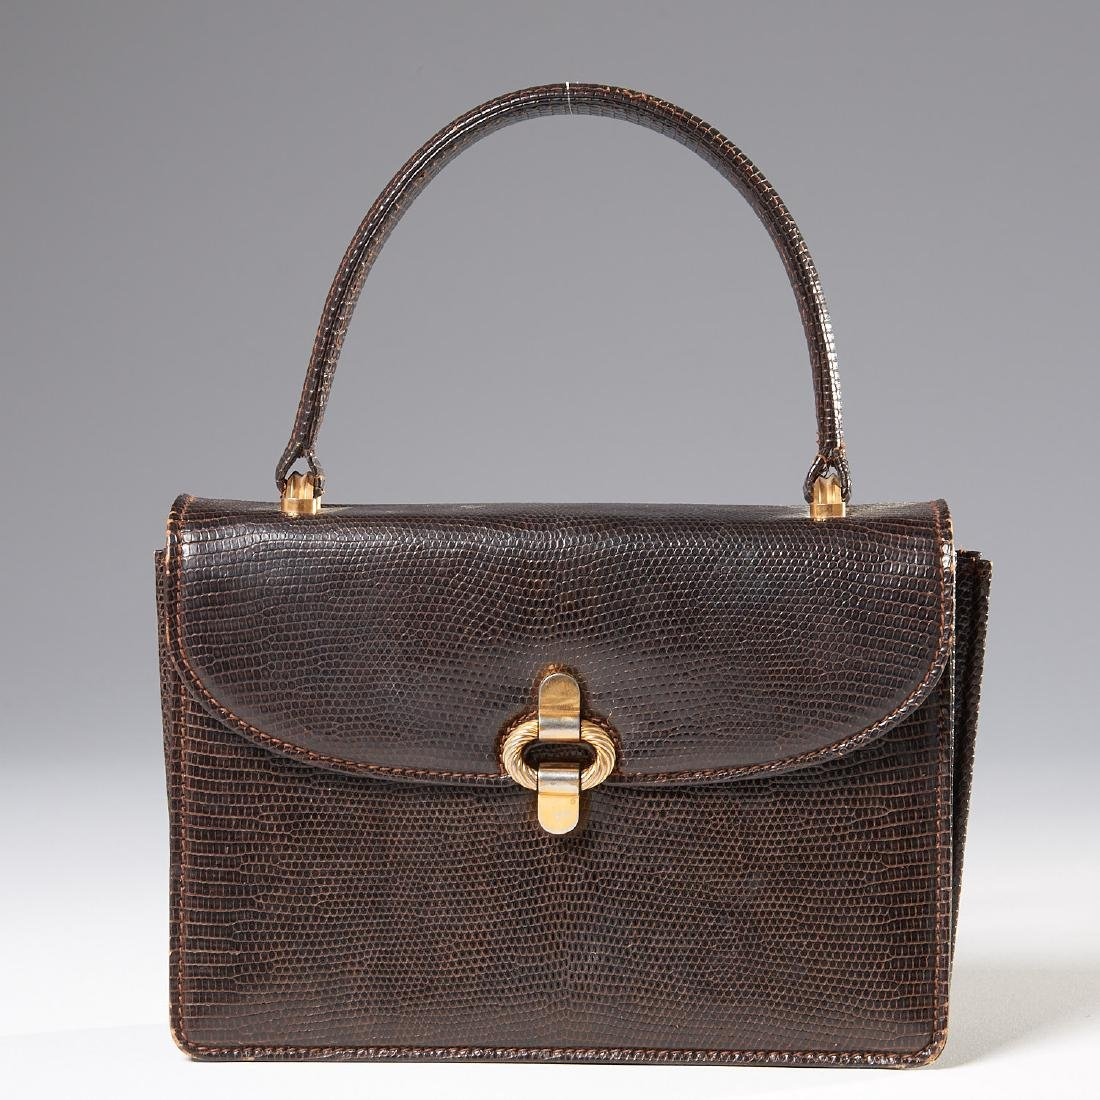 Gucci brown lizard handbag